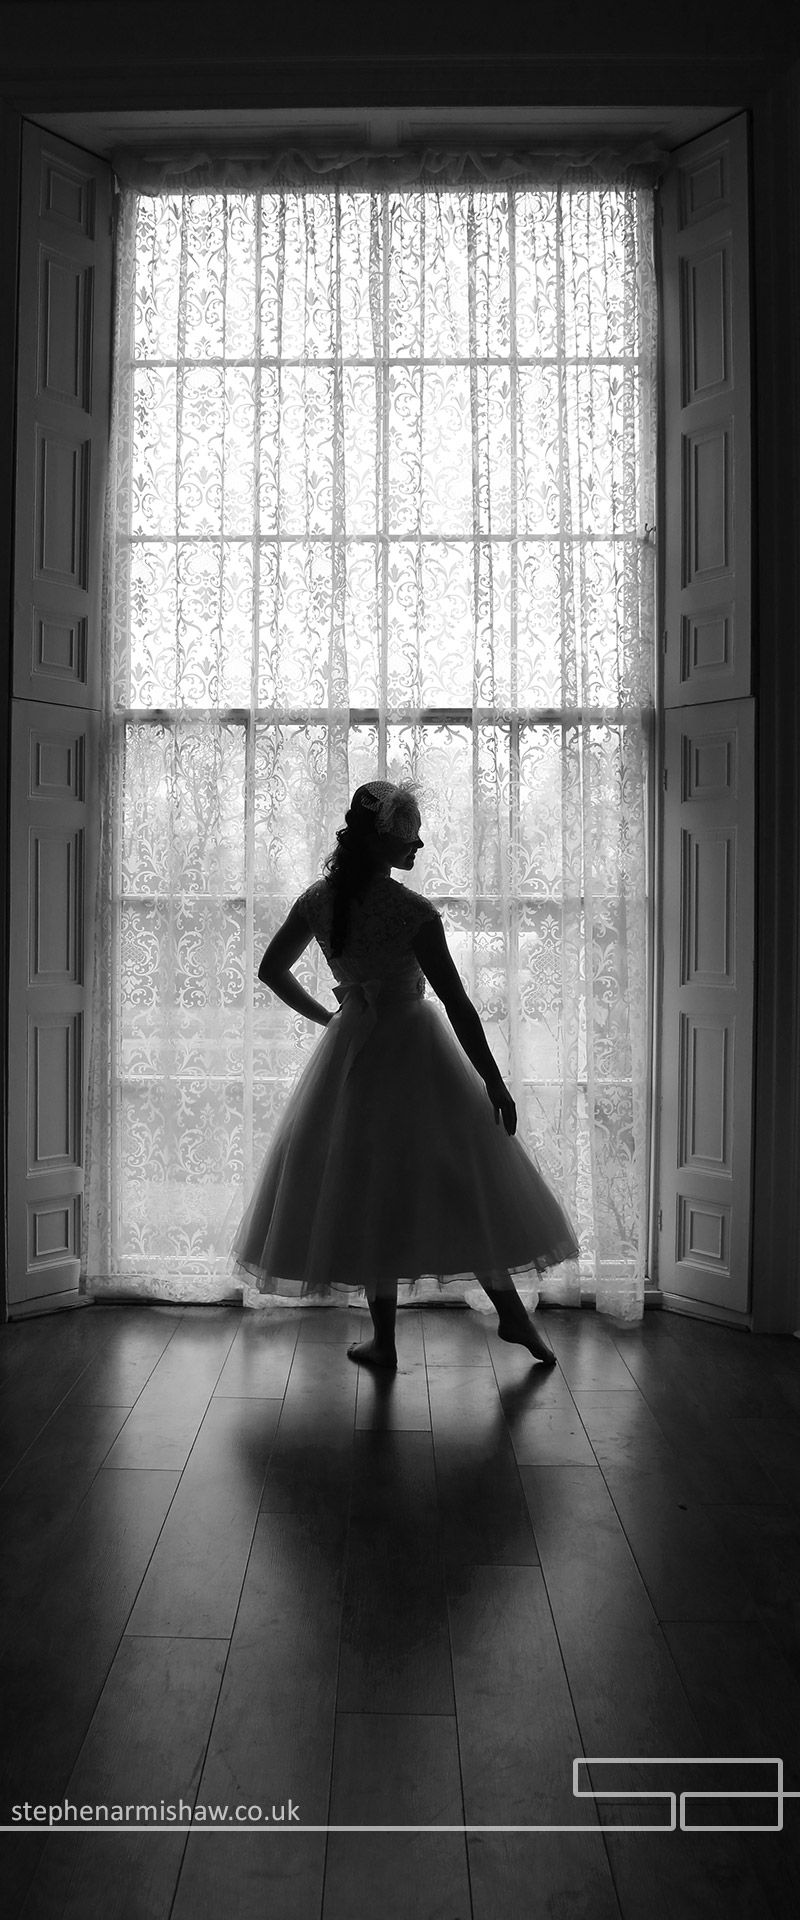 Atmospheric black and white at society weddings norwood house beverley by leading wedding photographer stephen armishaw